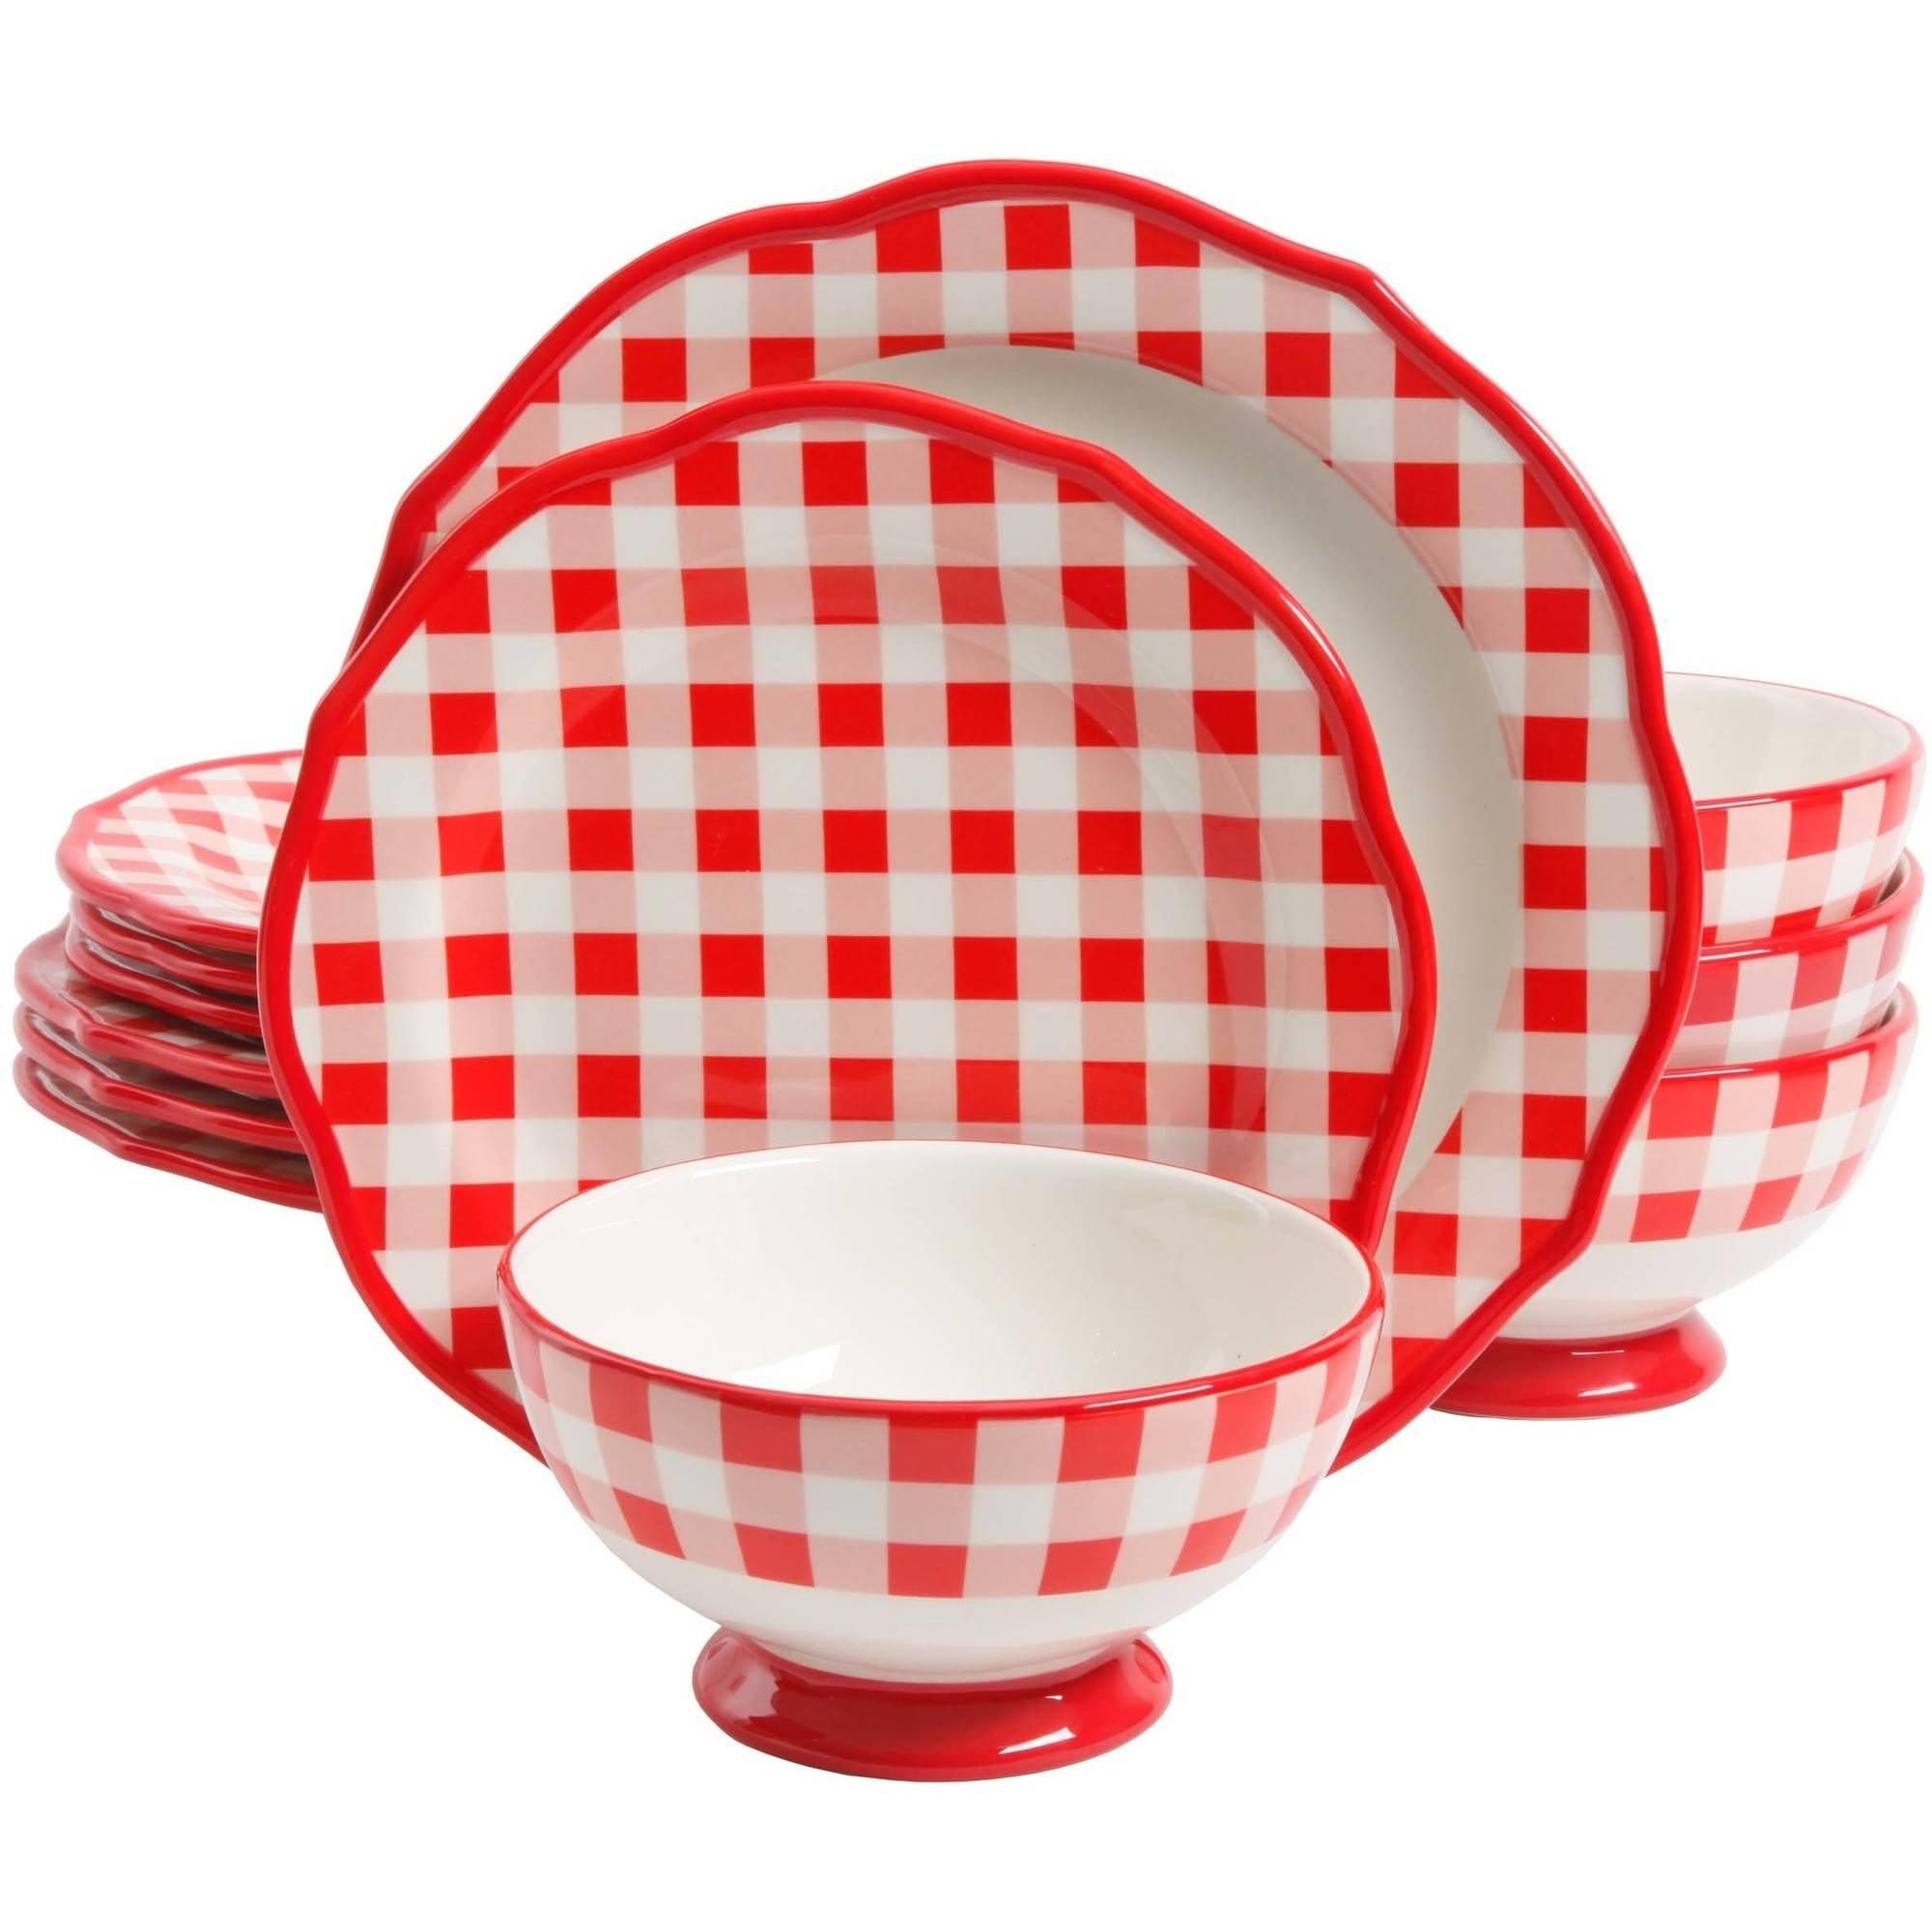 Pioneer Woman Red White Gingham Check Dinnerware Set Plates Bowls 12 pc  sc 1 st  eBay & Pioneer Woman Red White Gingham Check Dinnerware Set Plates Bowls 12 ...